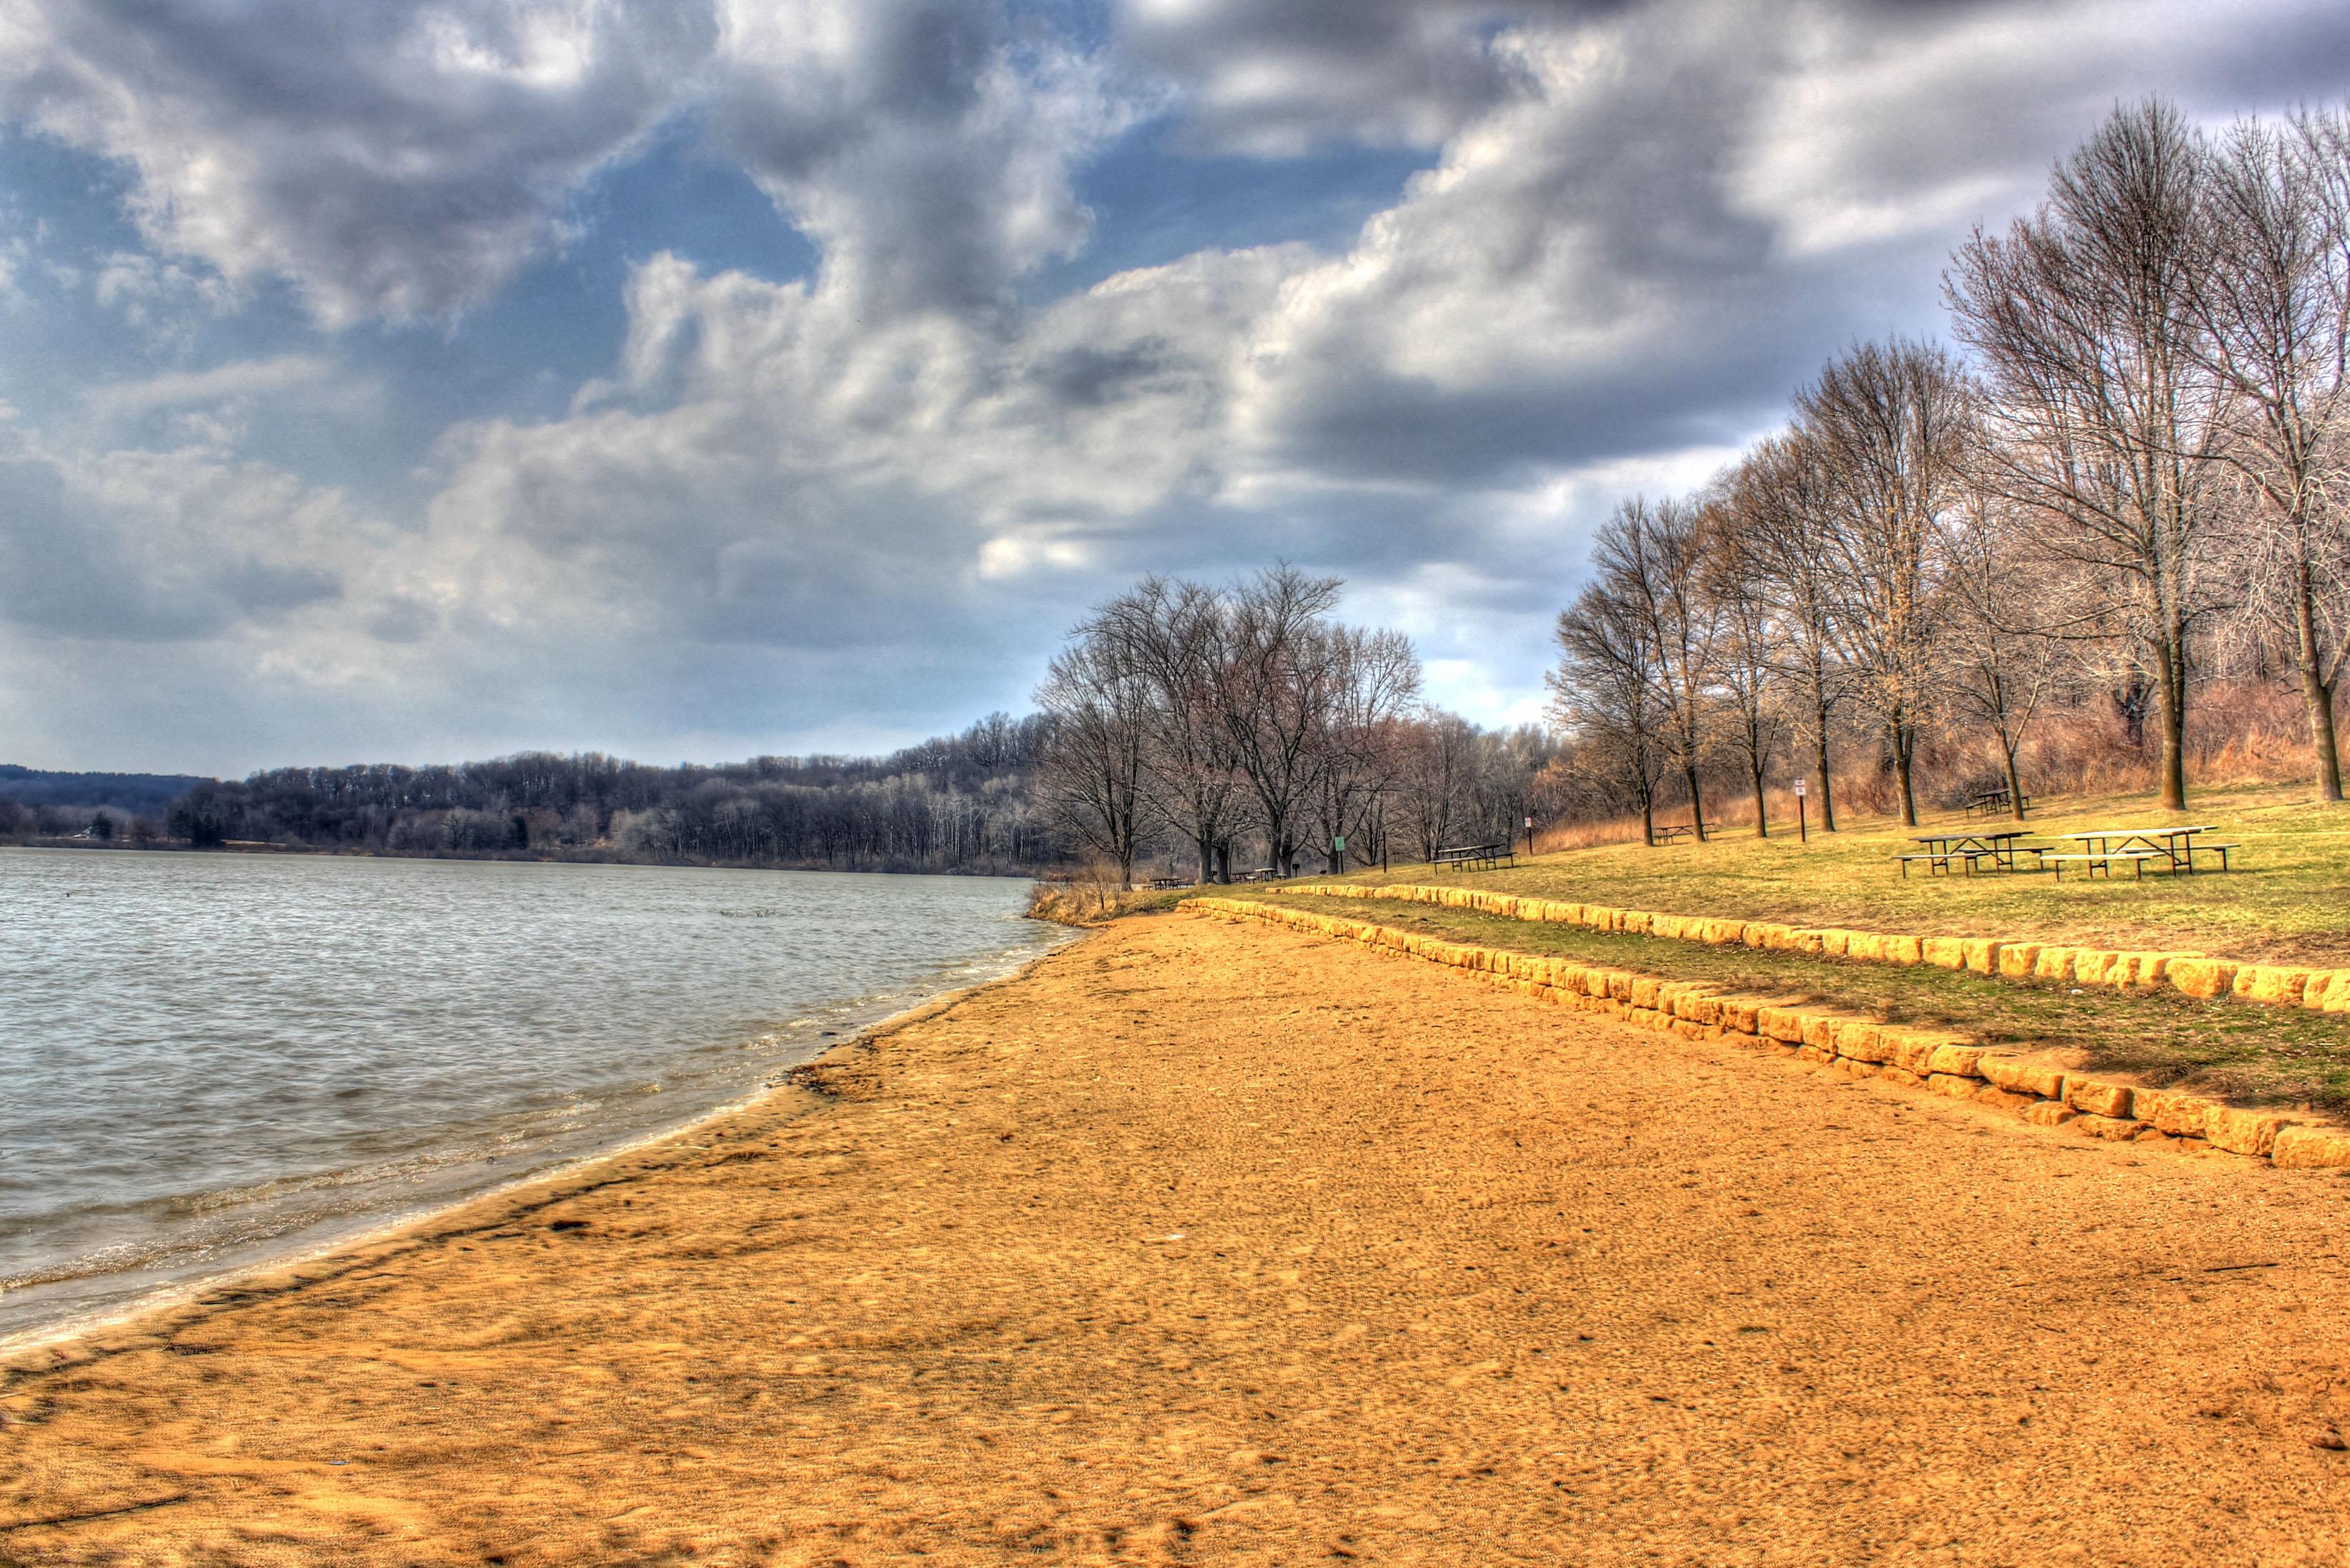 yellowstone-lake-shoreline.jpg